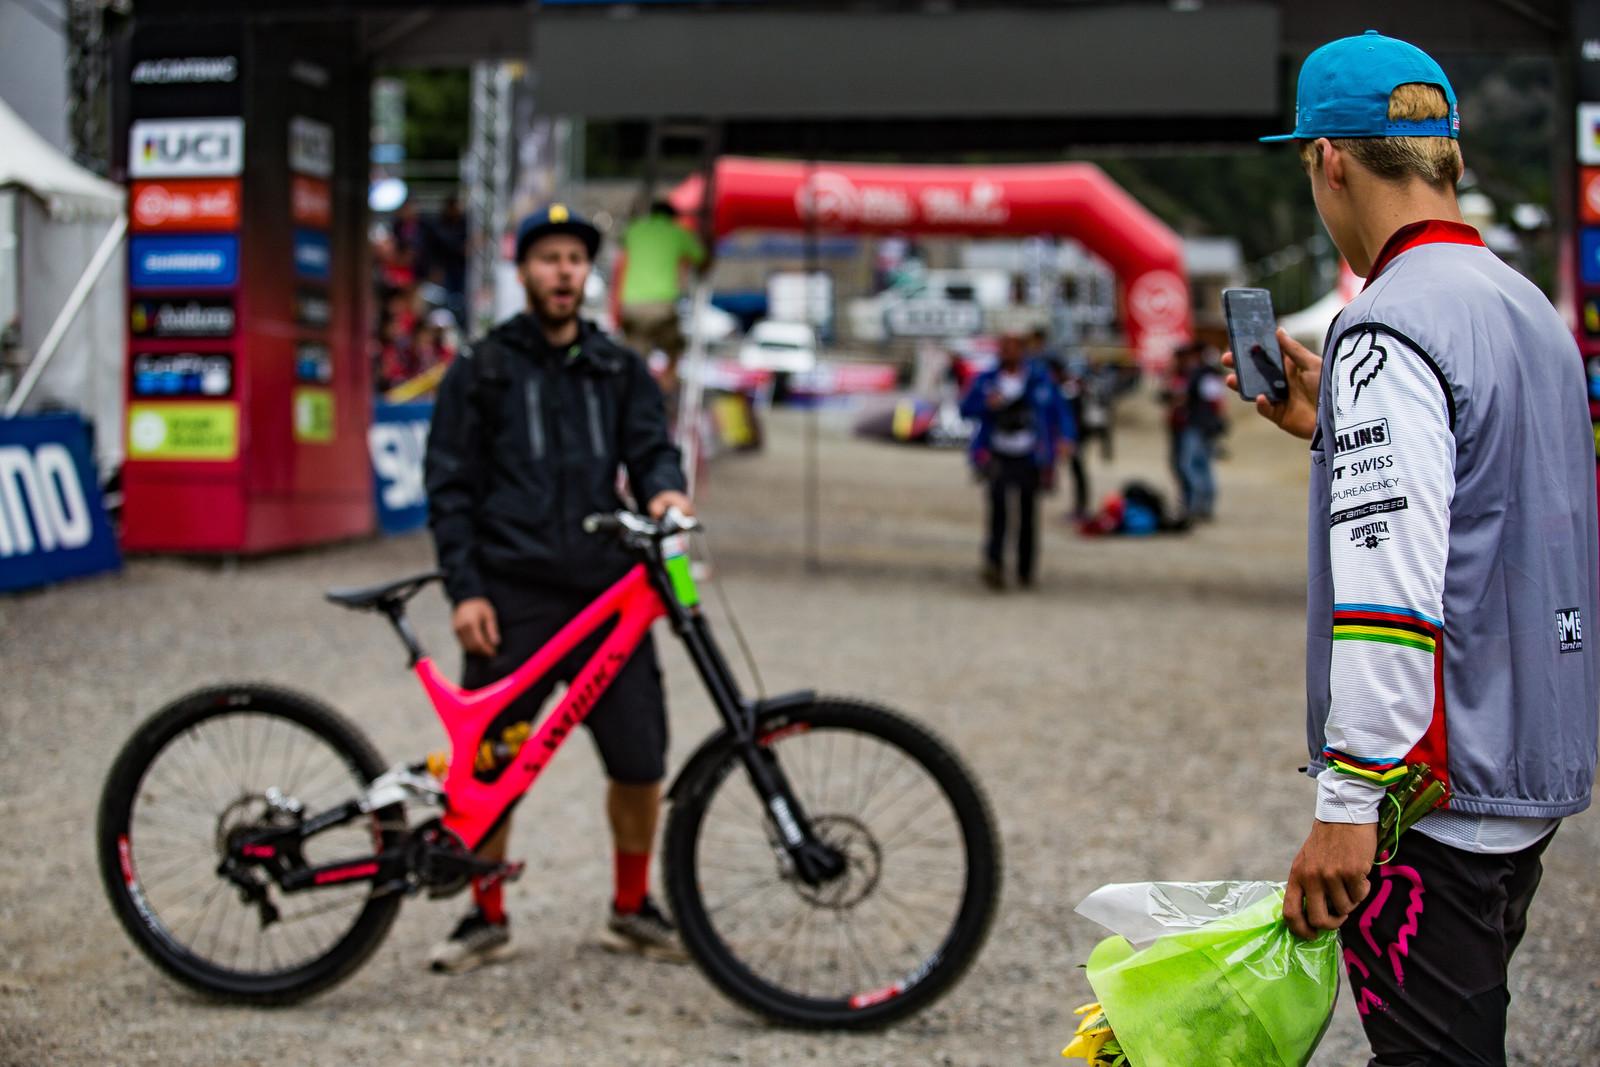 Finn Working after Winning - WINNING BIKE: Finn Iles' Specialized S-Works Demo - Mountain Biking Pictures - Vital MTB